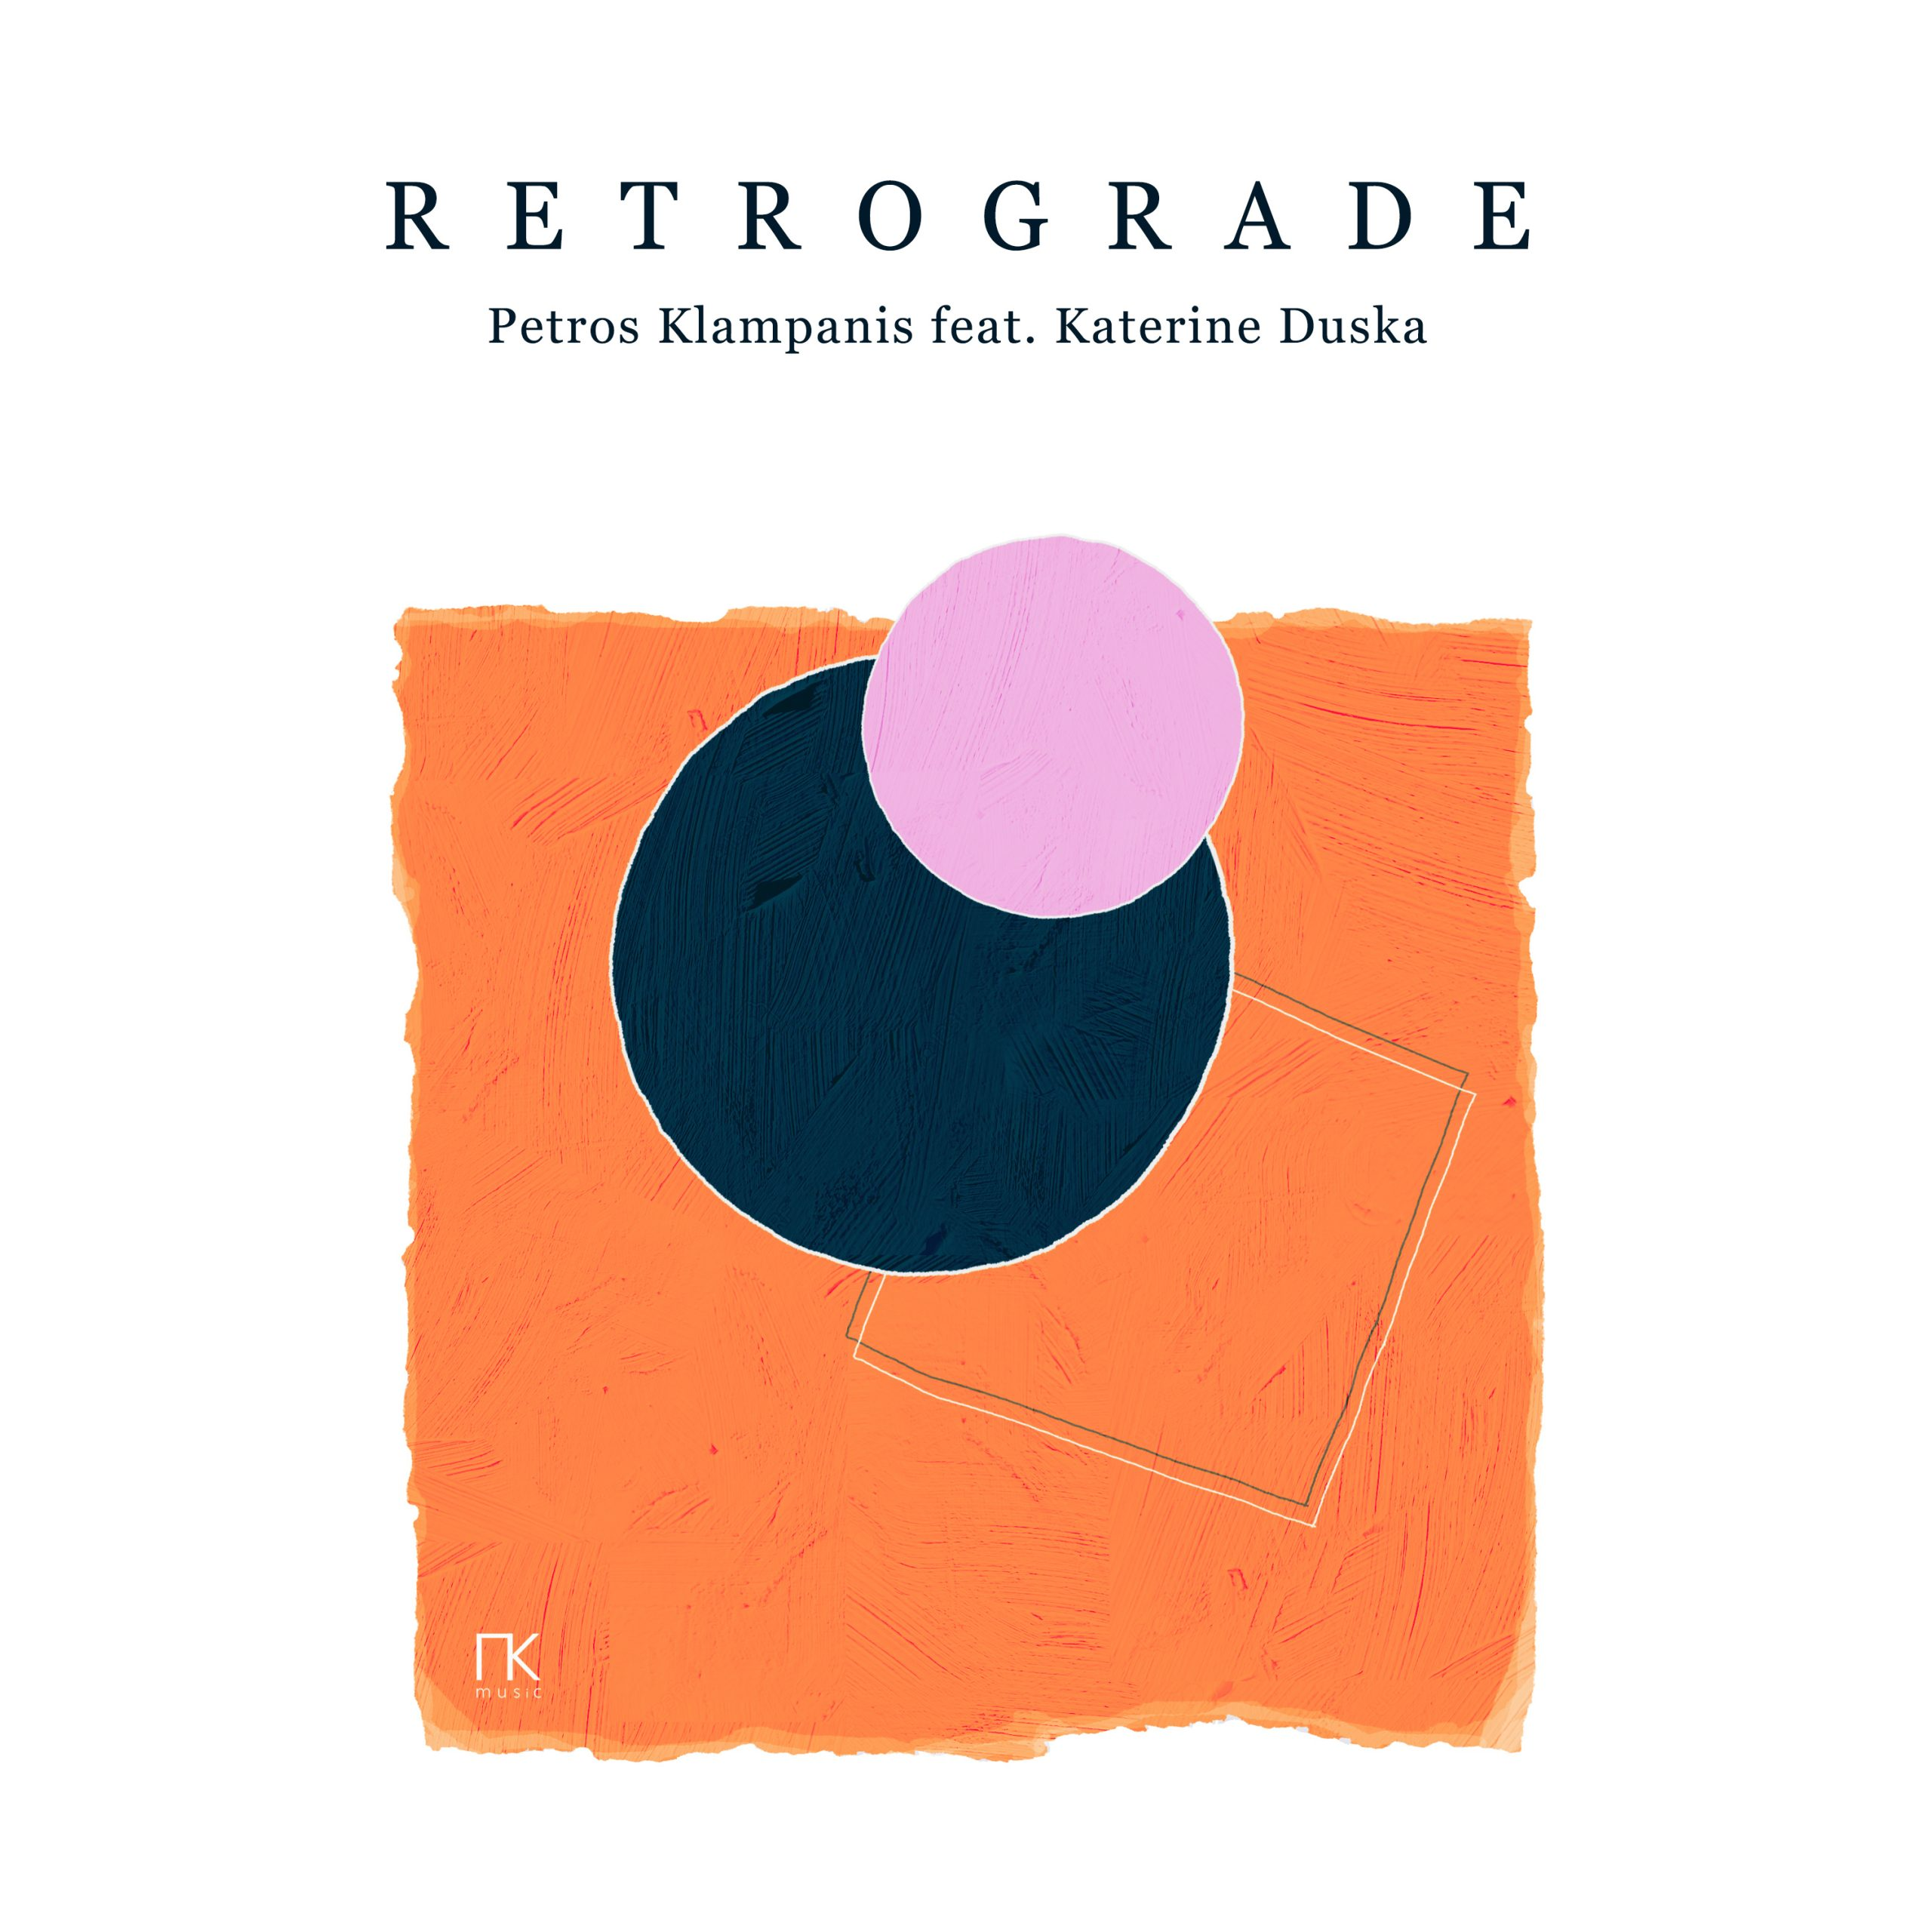 Retrograde: Ο Πέτρος Κλαμπάνης με την Κατερίνα Ντούσκα